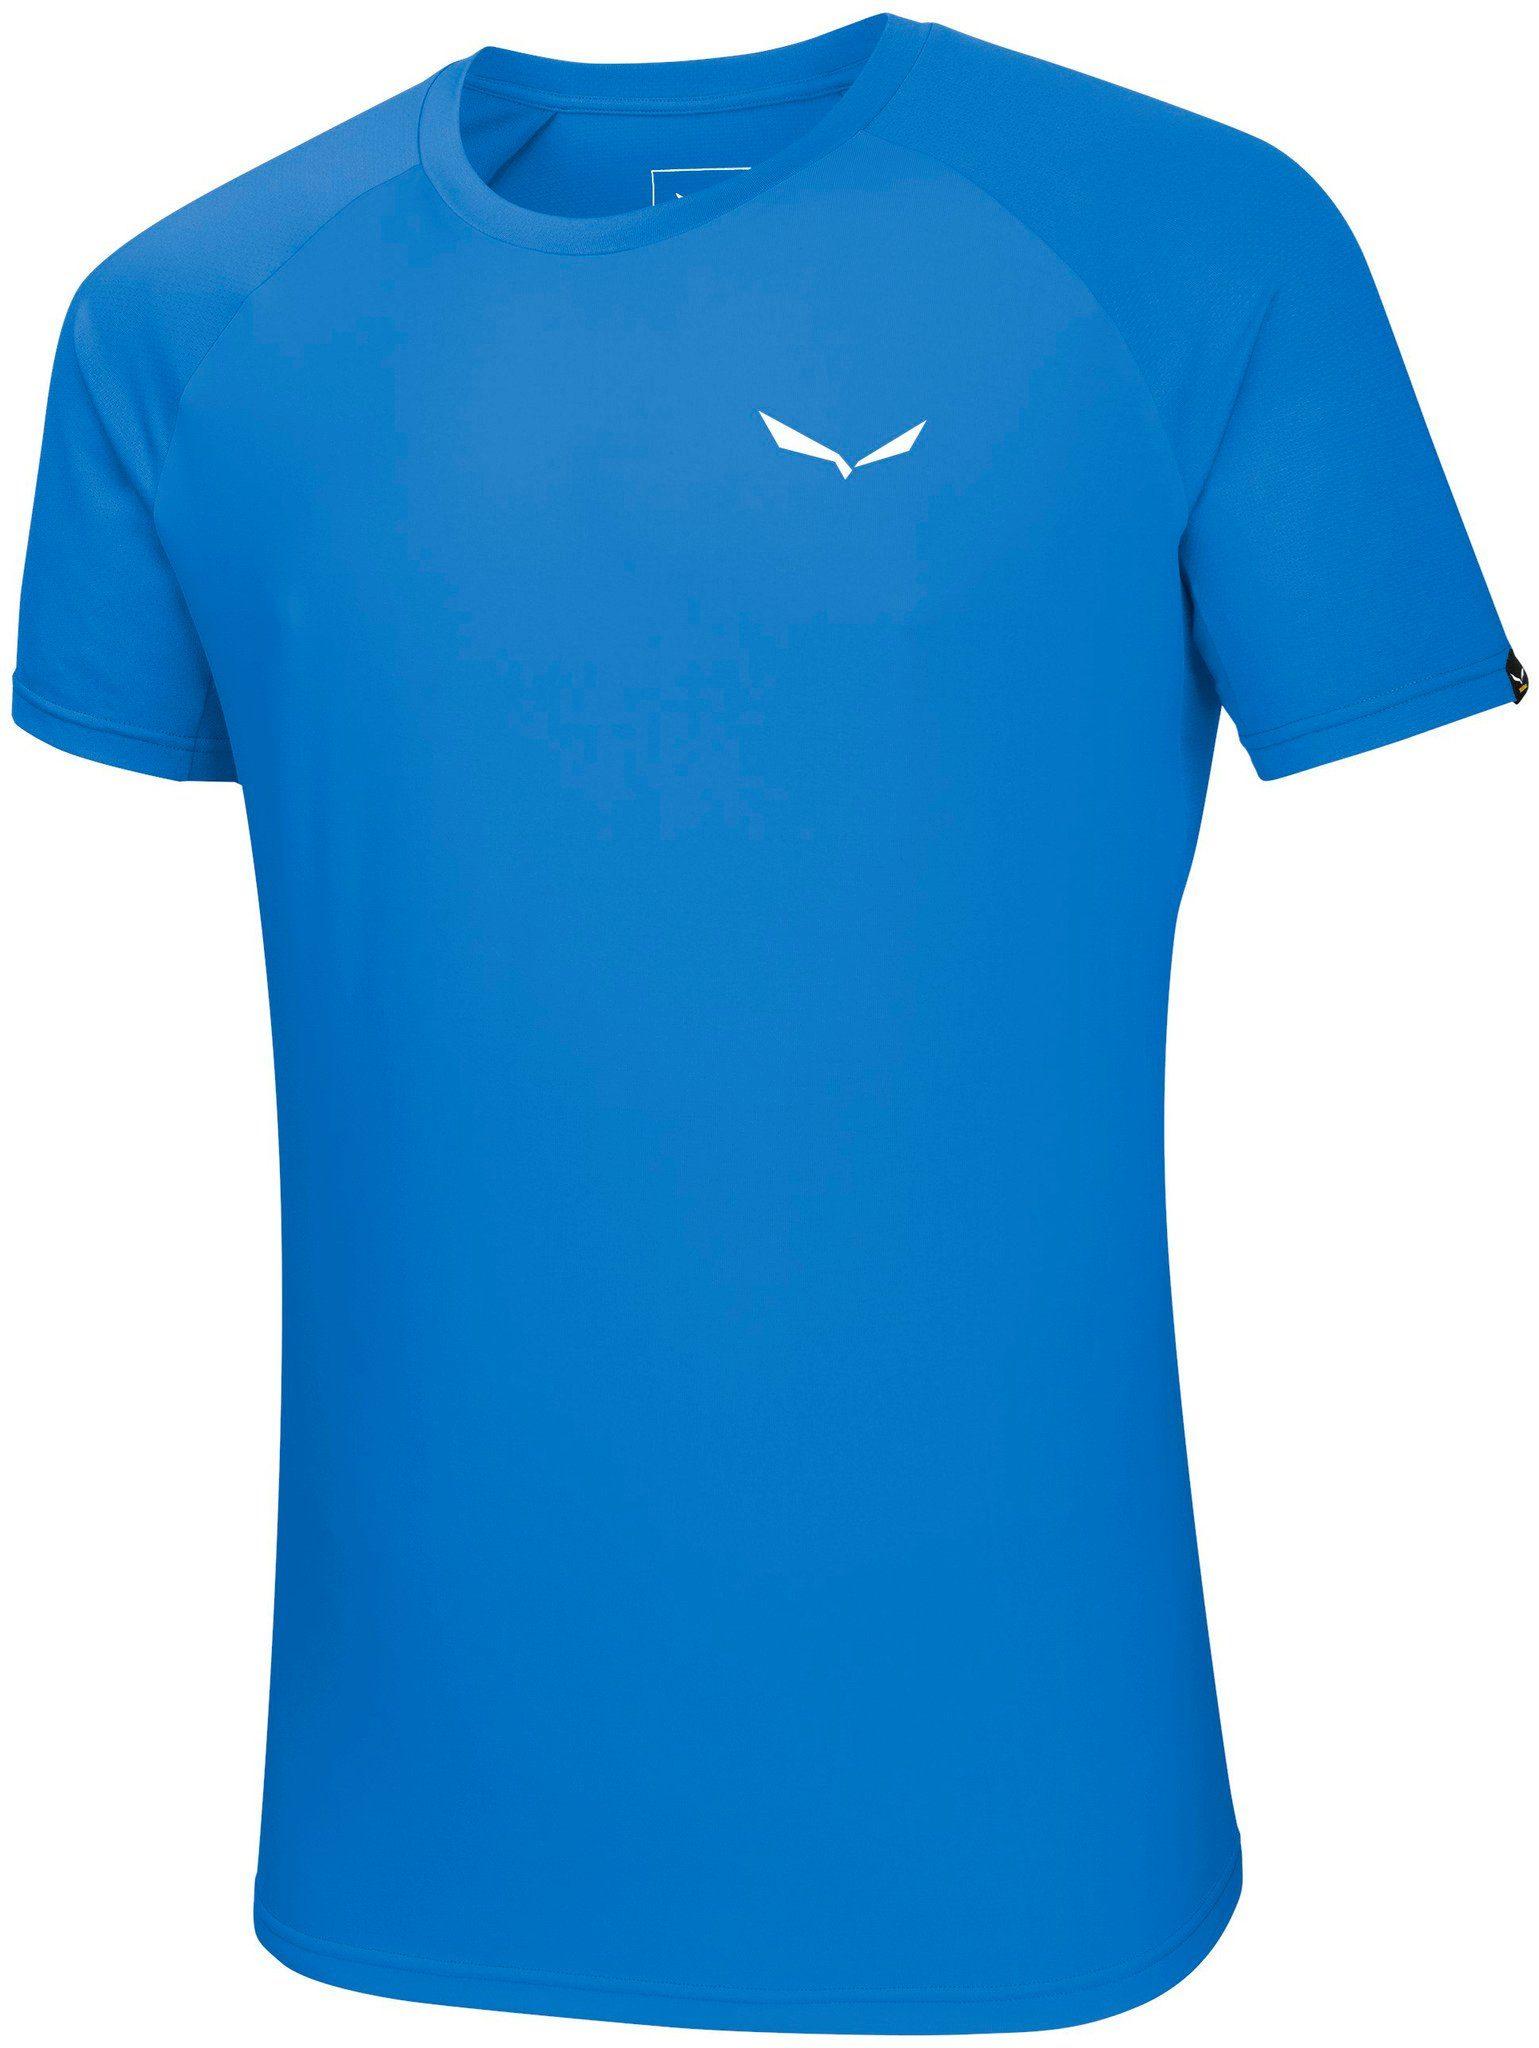 Salewa T-Shirt »Agner Climb Dry S/S Tee Men«